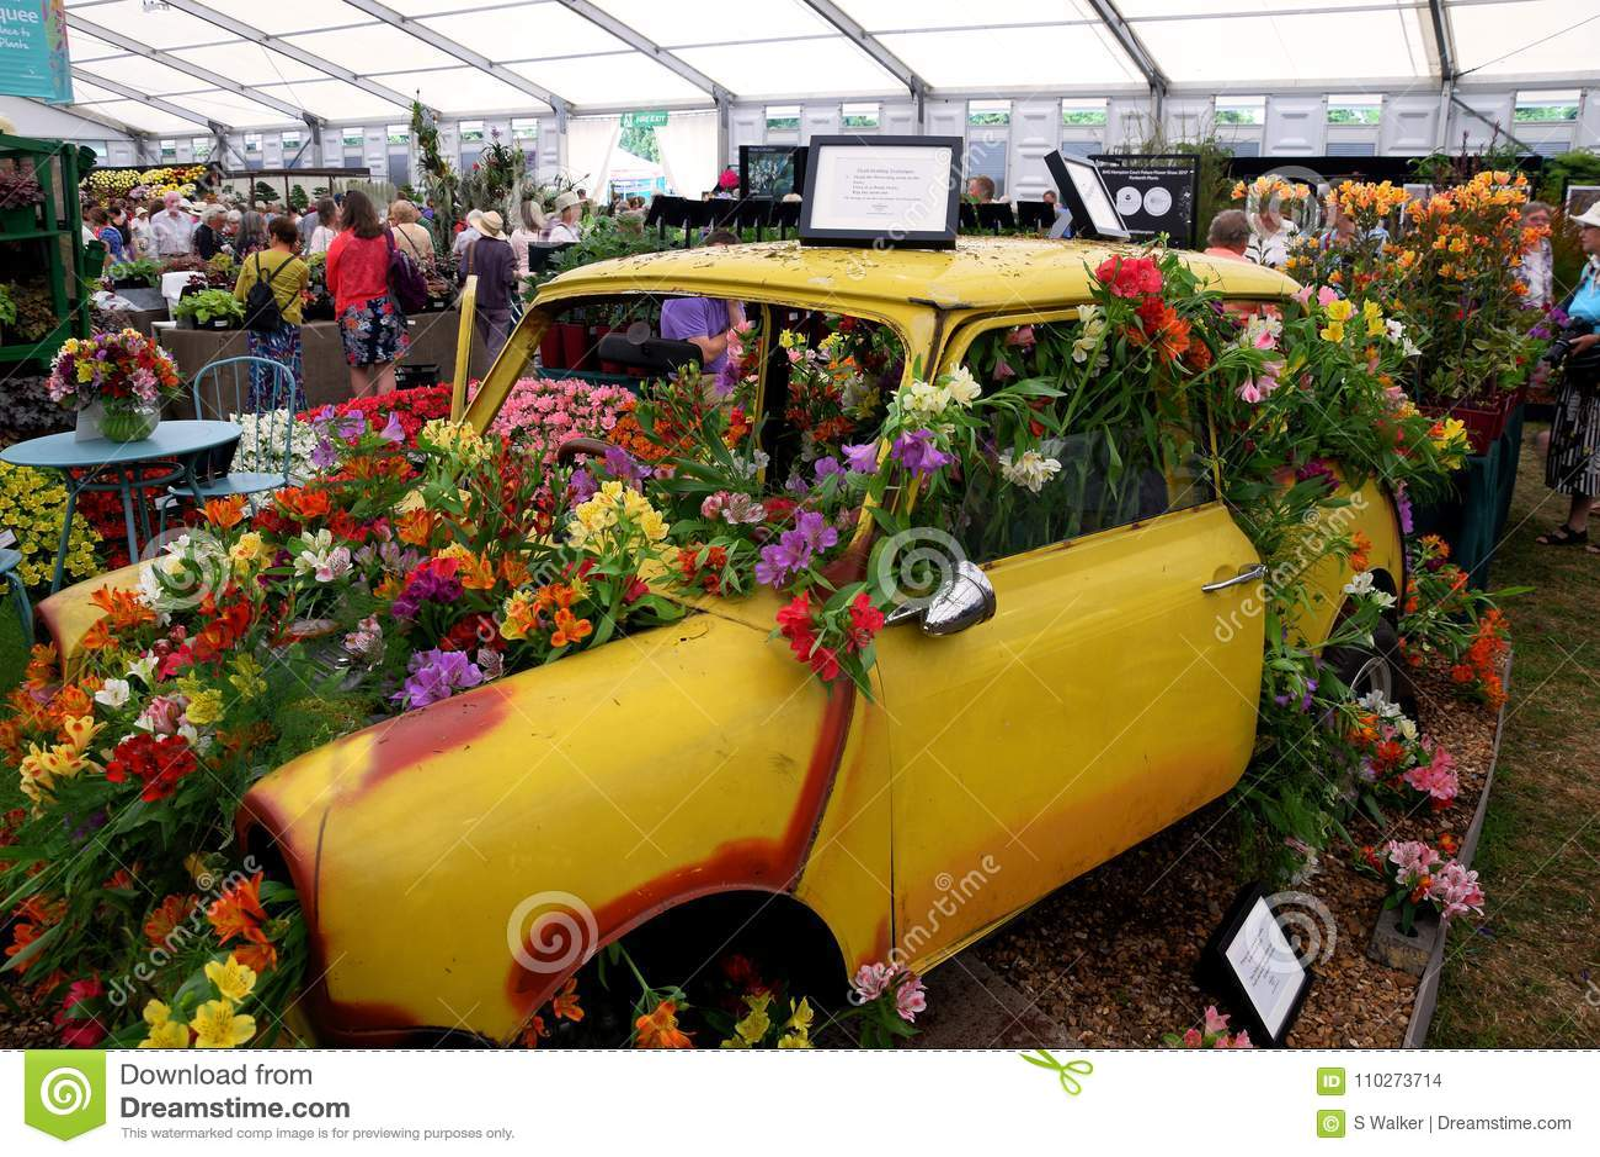 Mini carro amarelo, decorado com os lírios peruanos brilhantemente coloridos